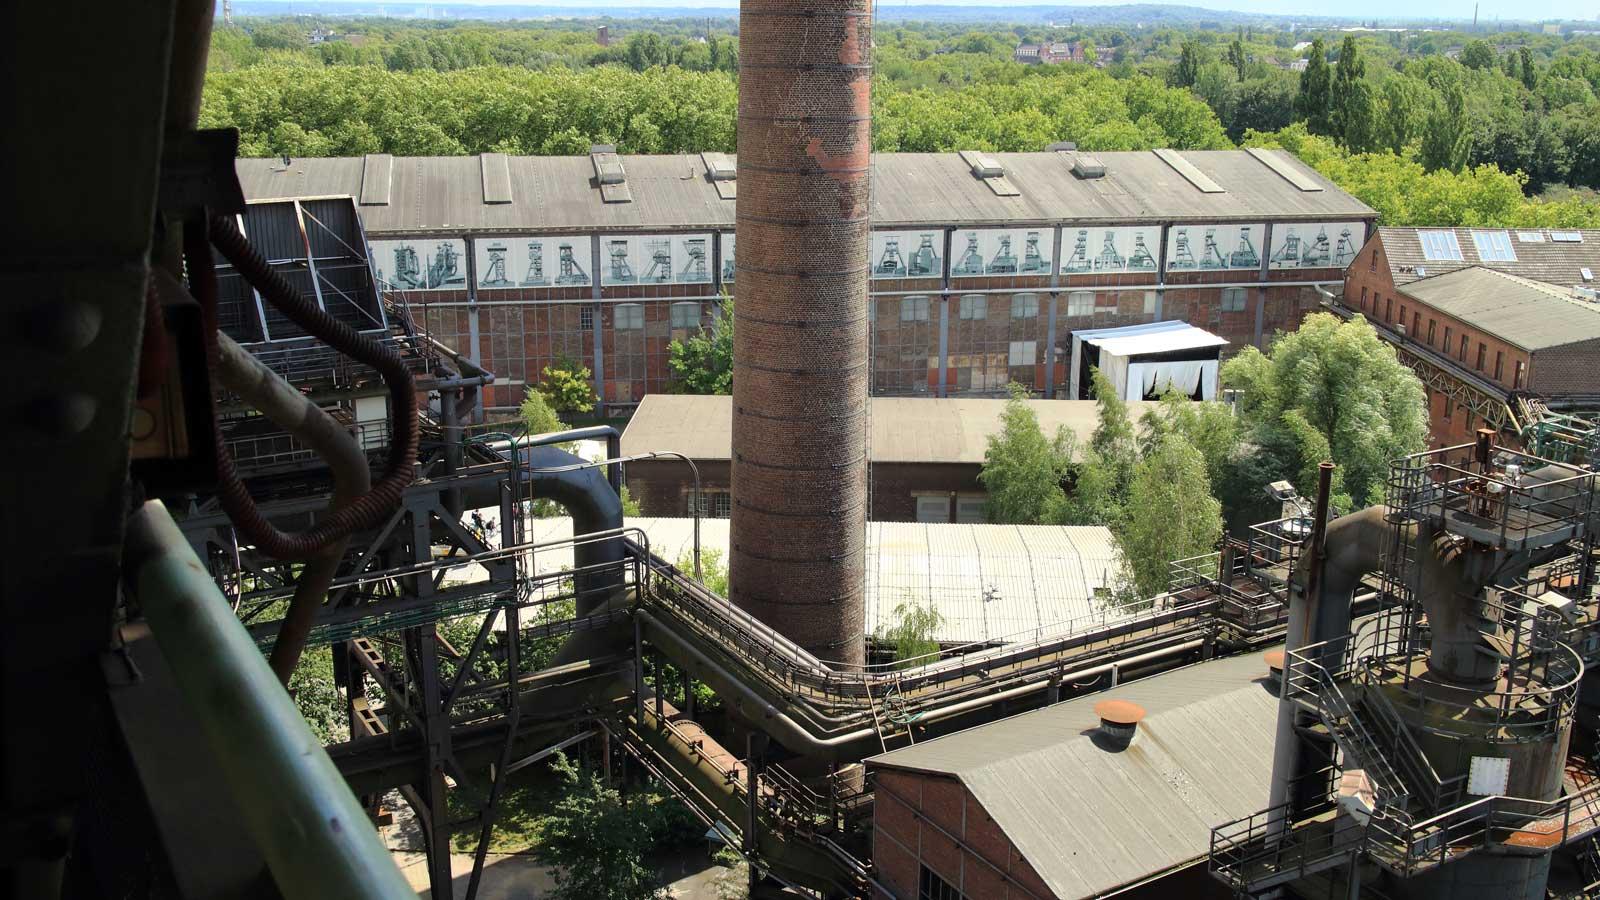 Rhine-18-08-14_16-34-53